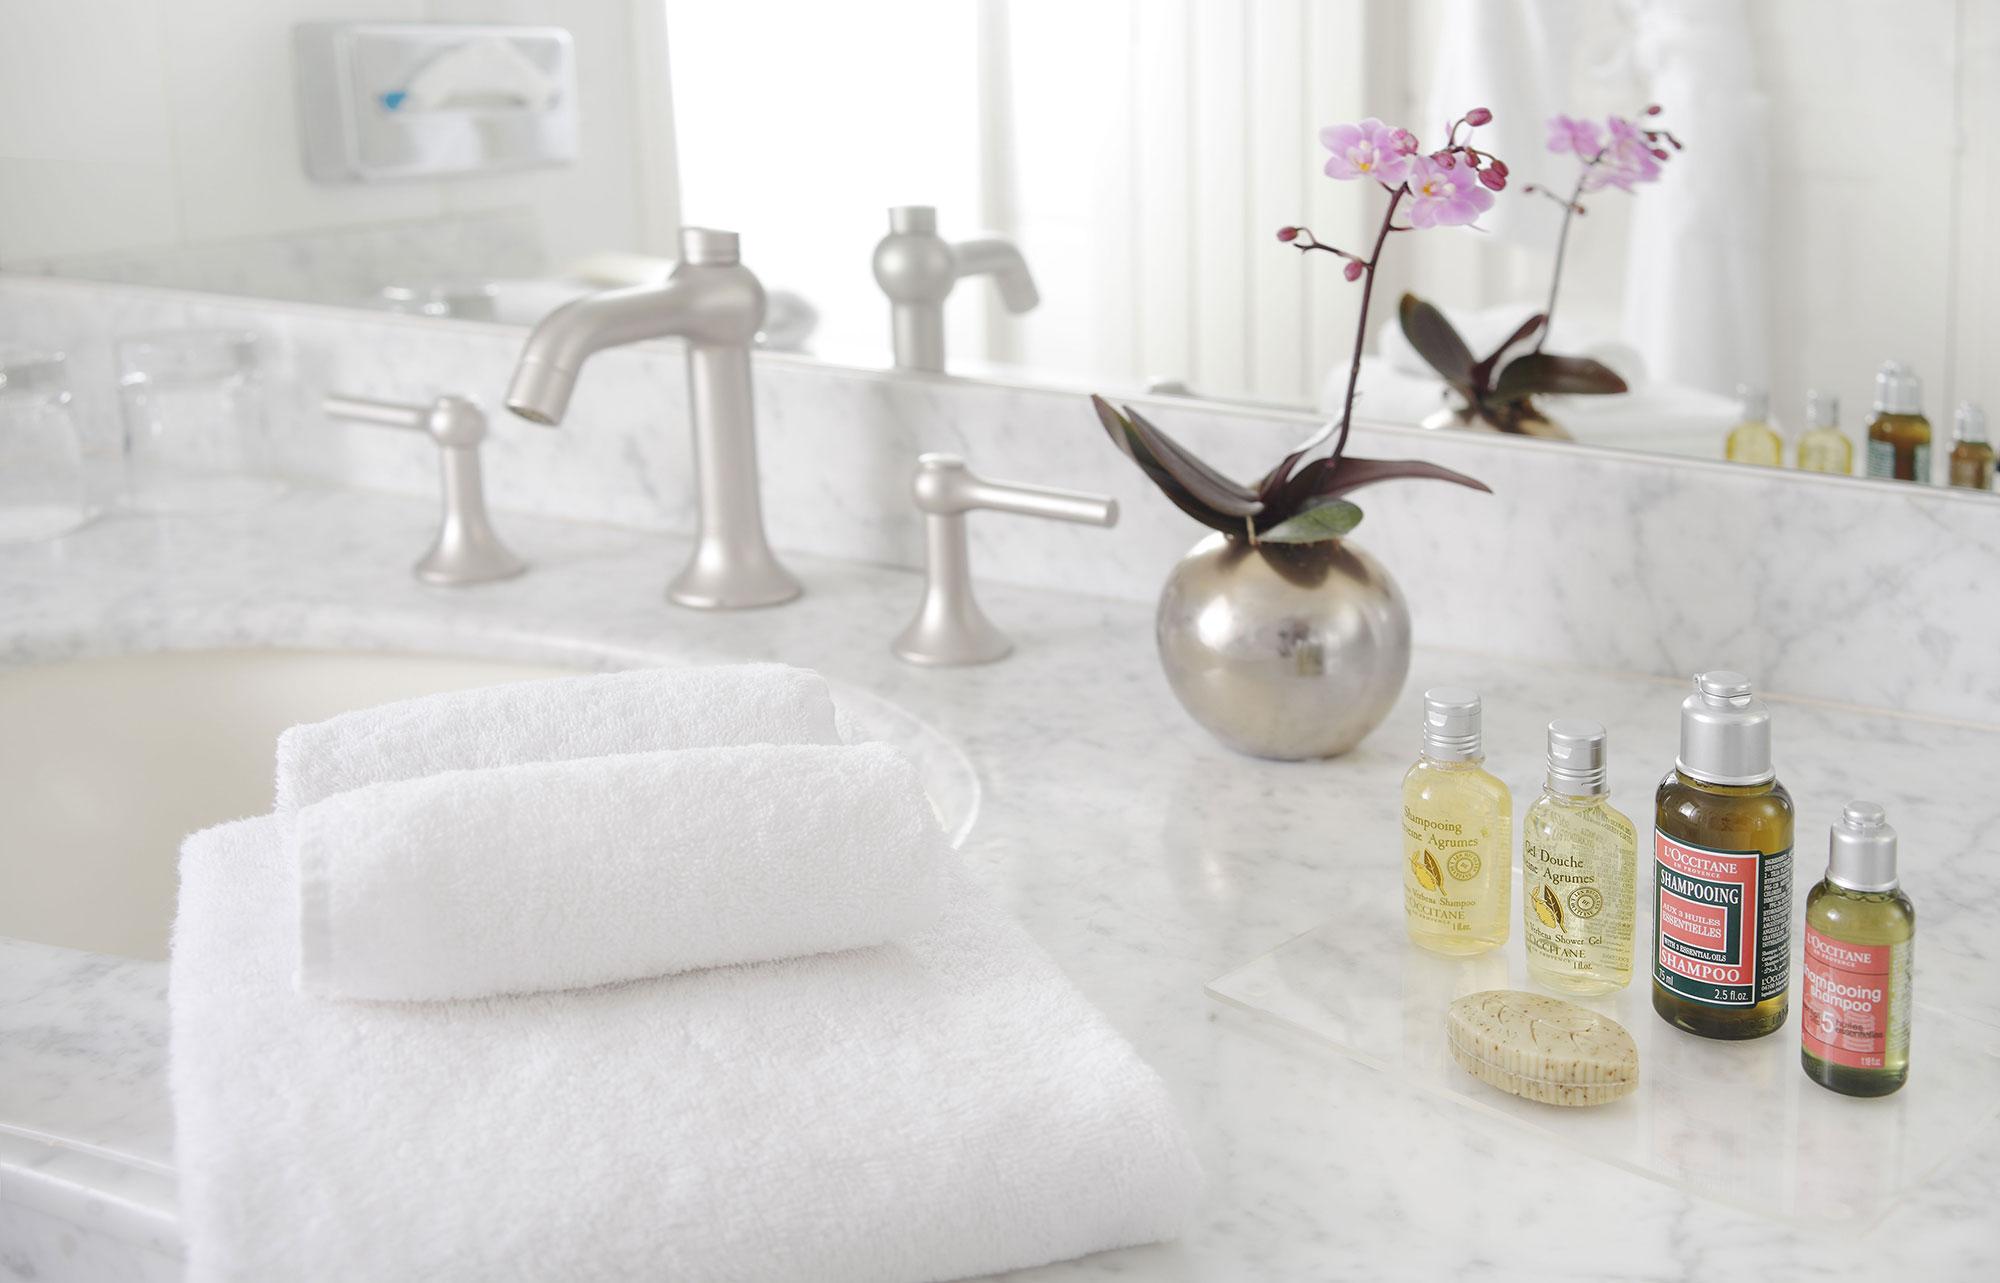 chambre familiale superieure design hotel regencia paris. Black Bedroom Furniture Sets. Home Design Ideas